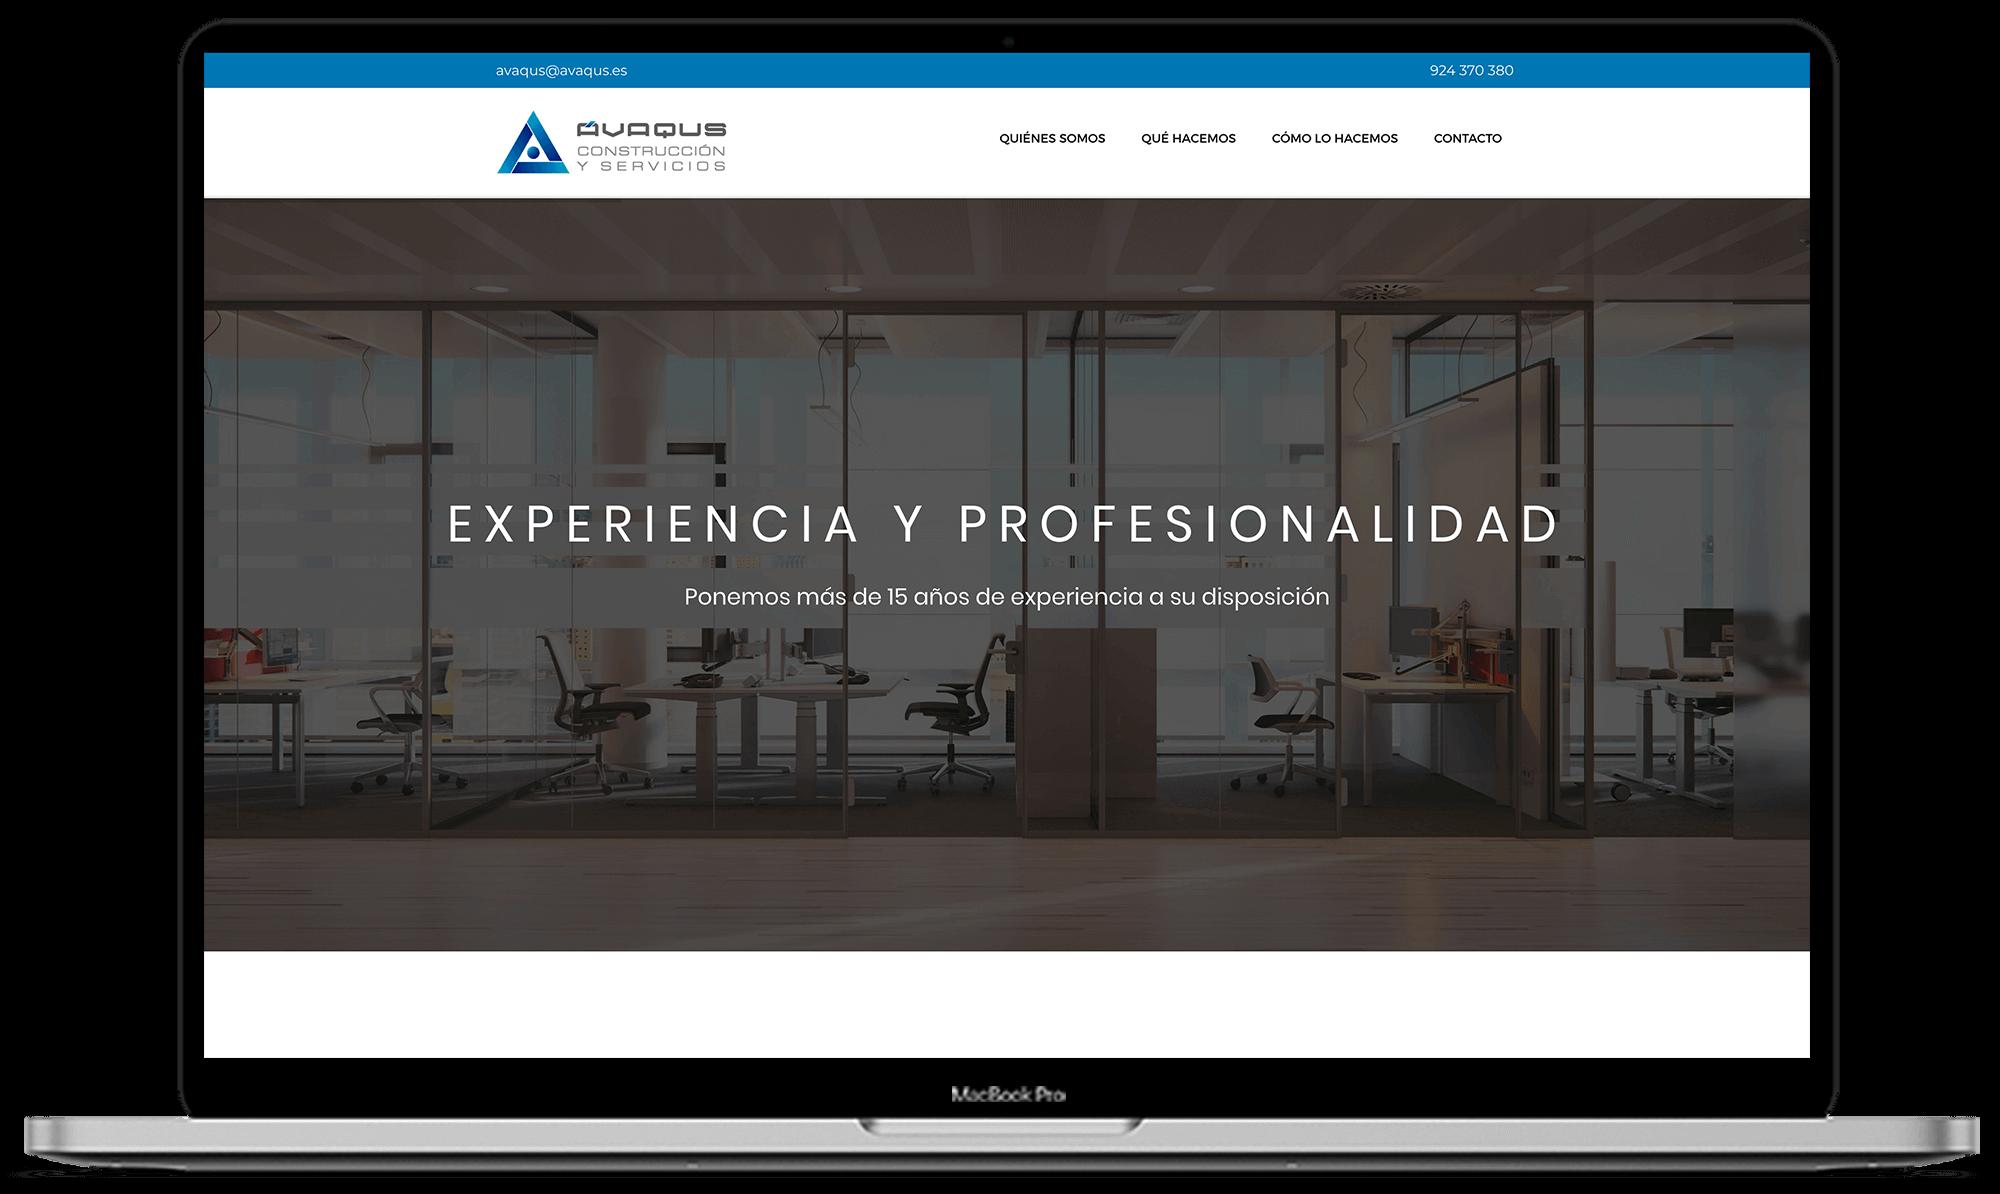 Ávaqus diseño web + identidad corporativa - Synapse   Smart technologies